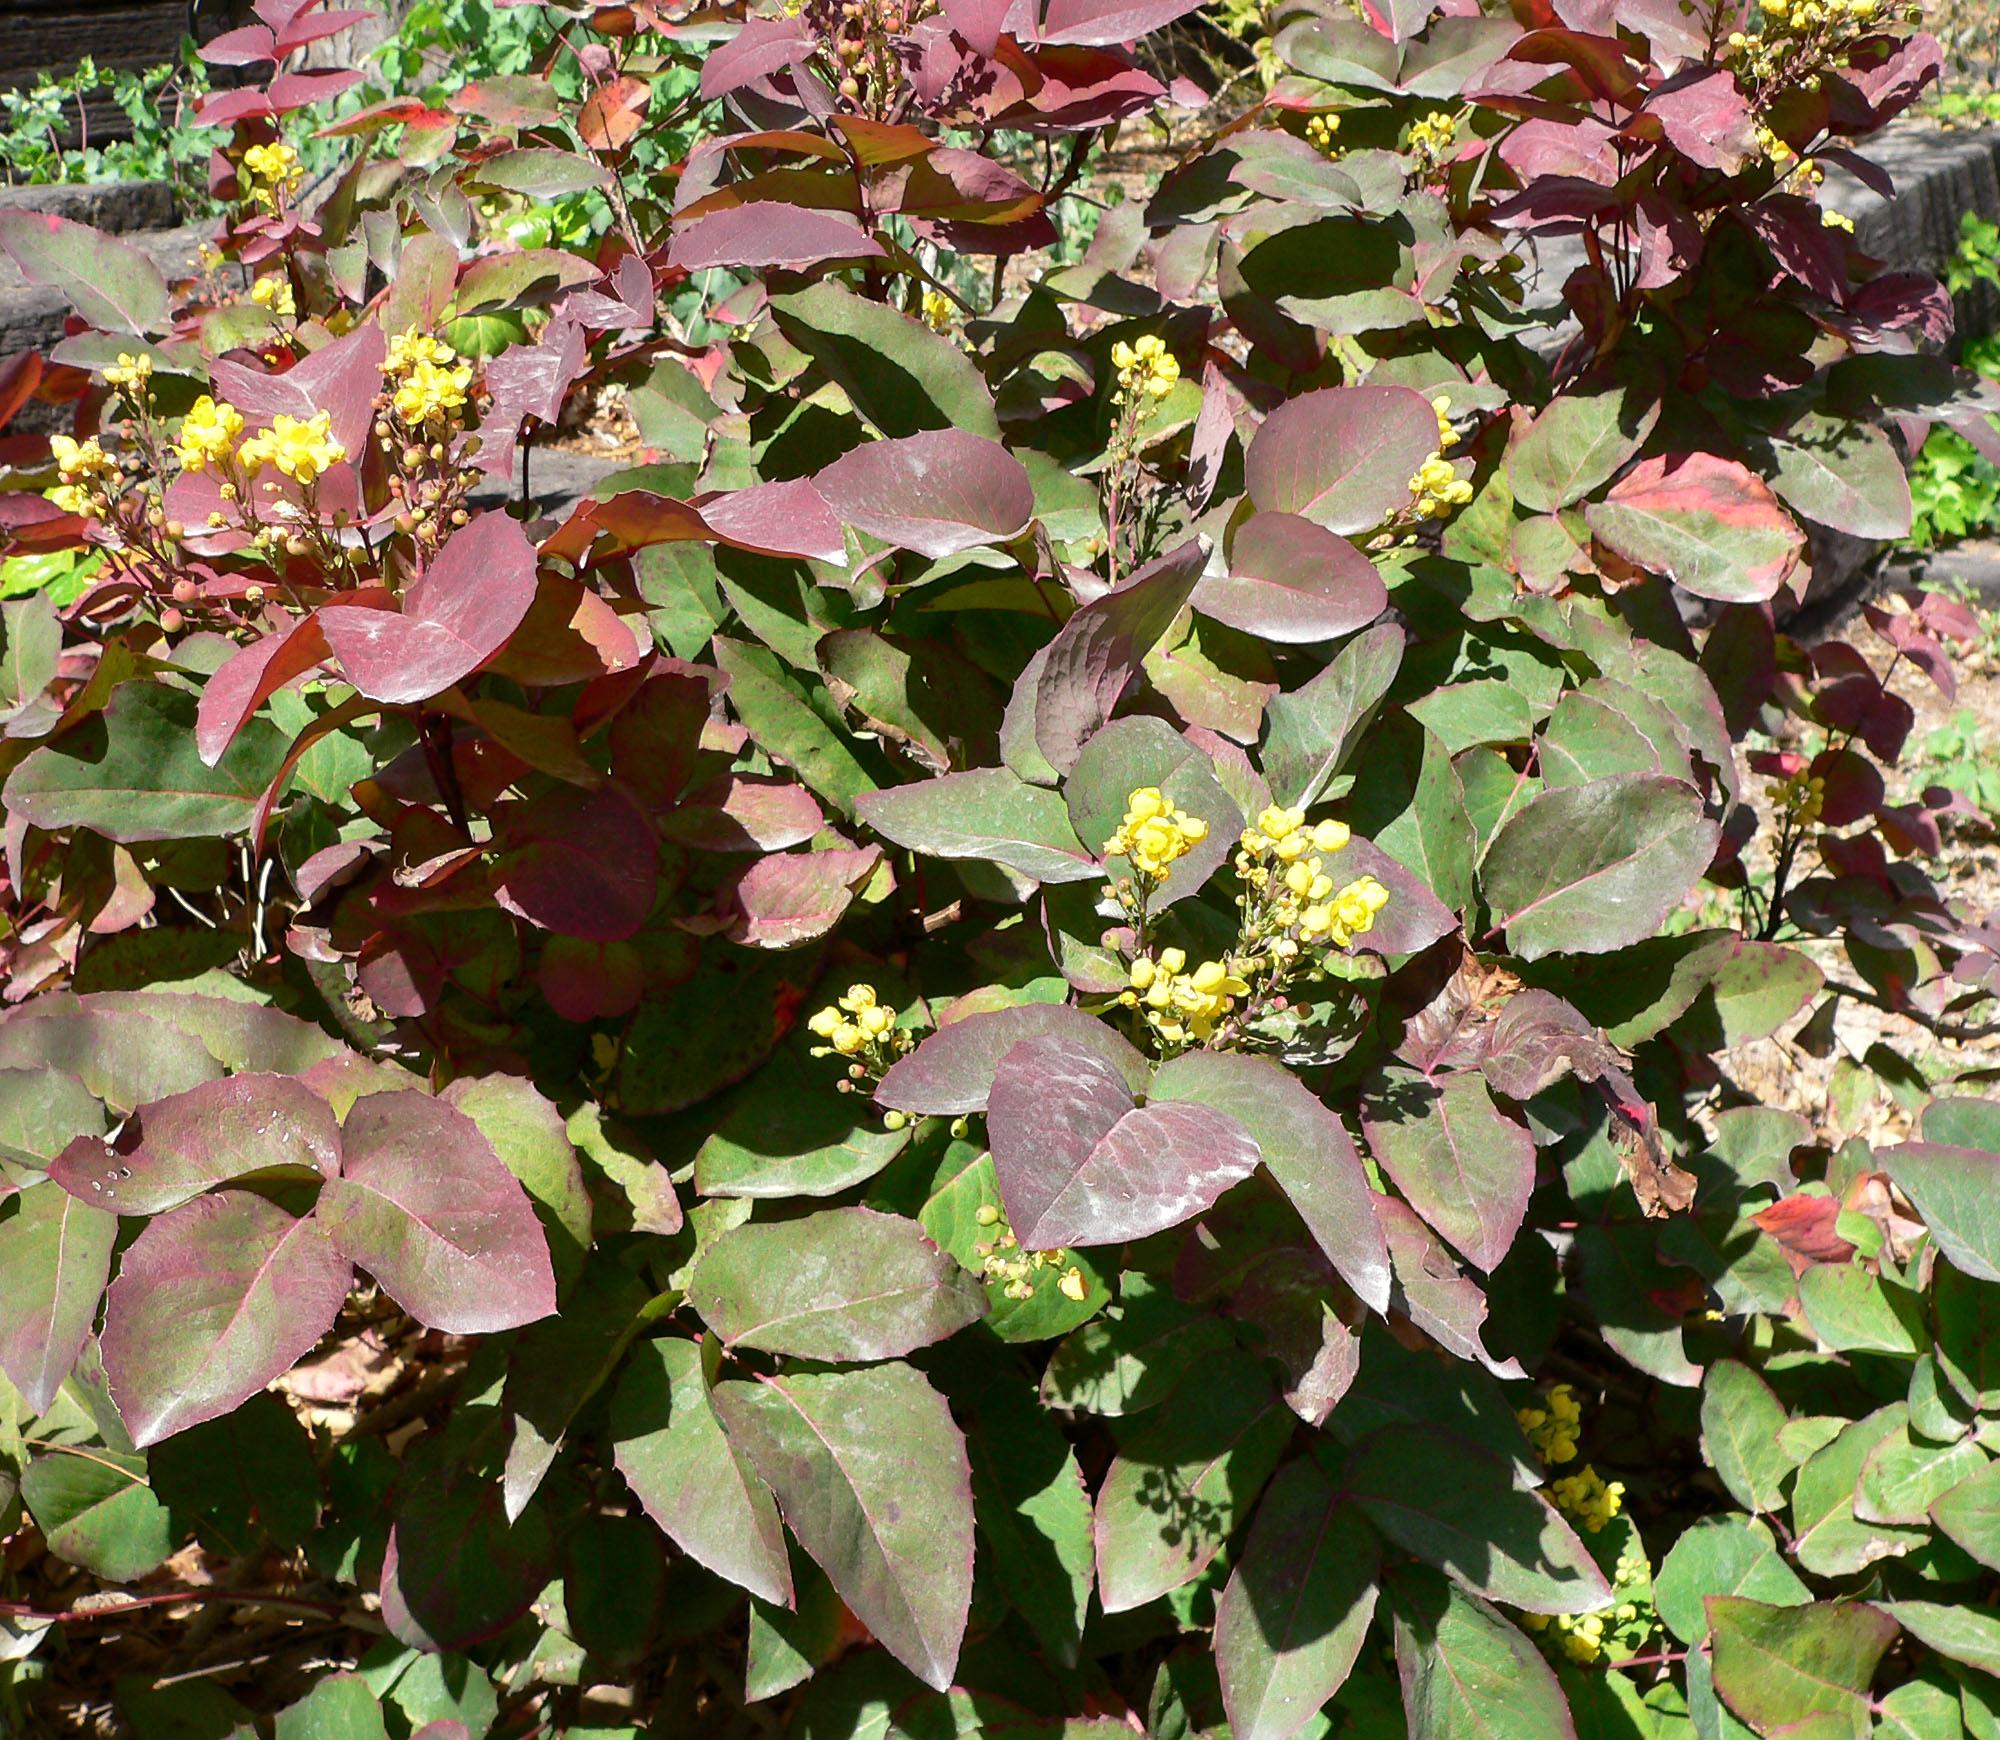 Picture of Live Compact Oregon Grape aka Mahonia a. 'Compacta' Shrubs Plant Fit 5 Gallon Pot